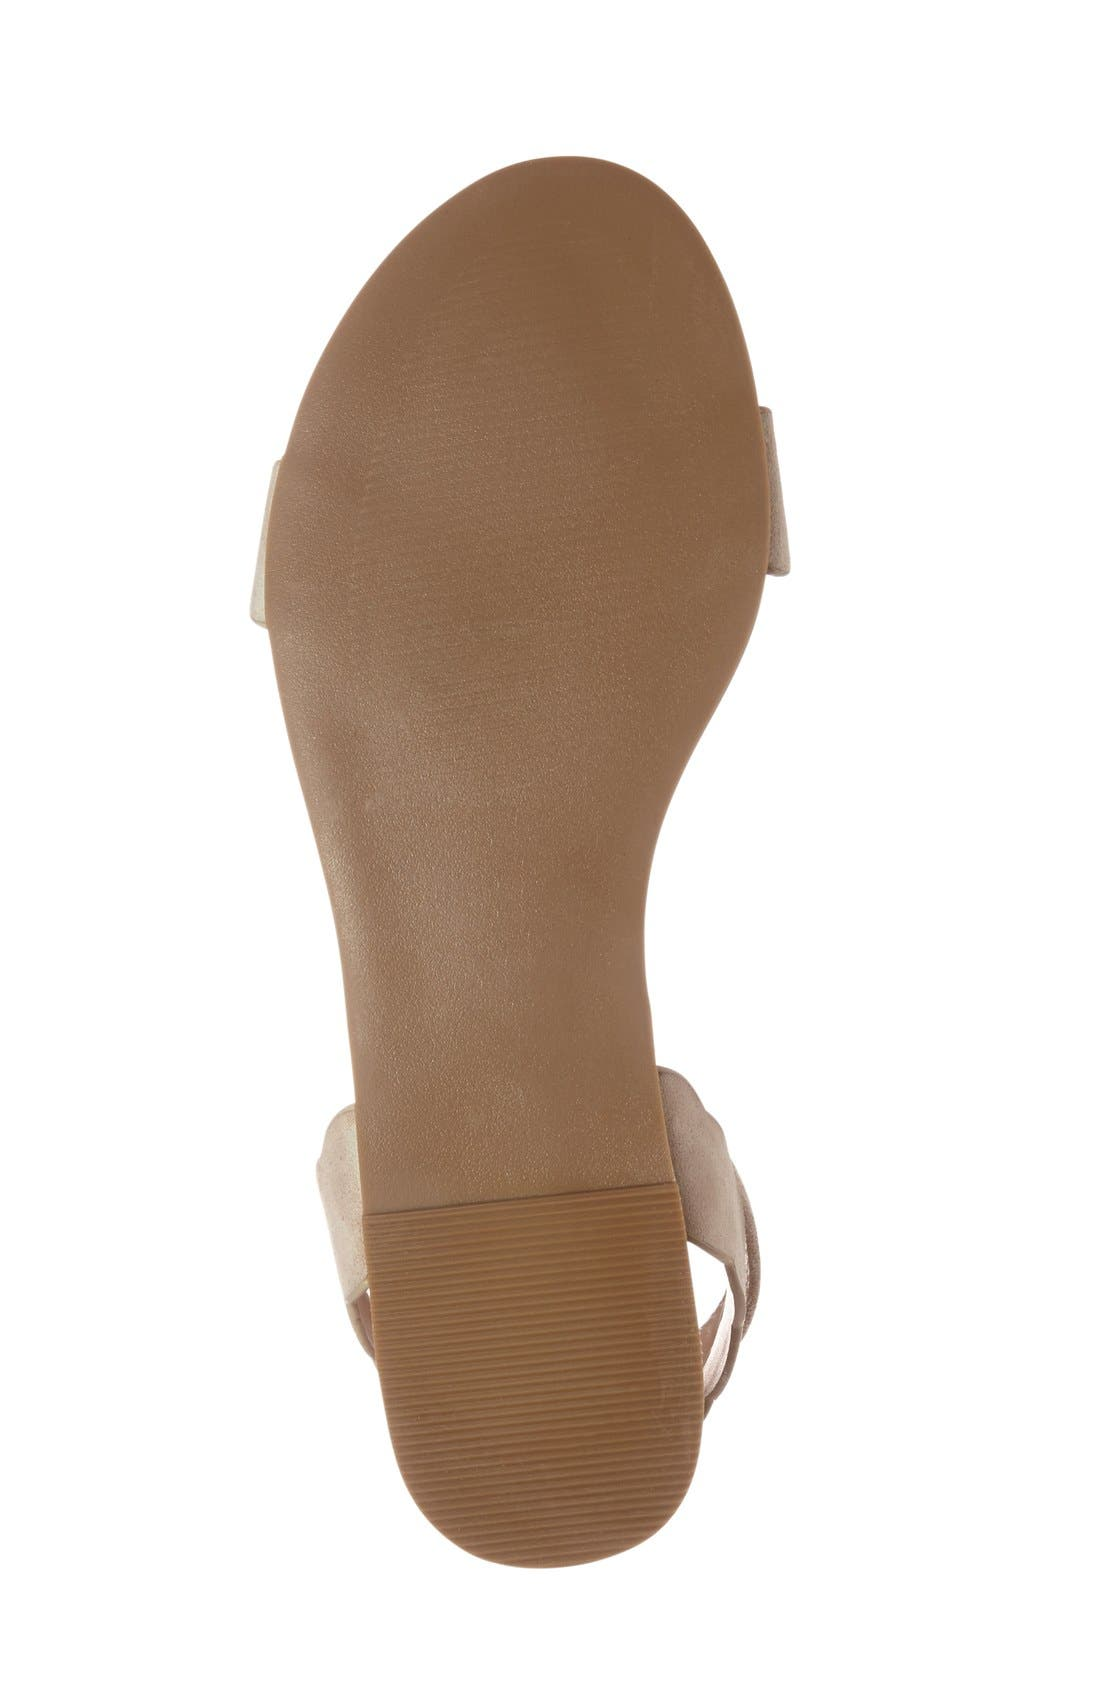 'Odette' Scalloped Ankle Strap Flat Sandal,                             Alternate thumbnail 26, color,